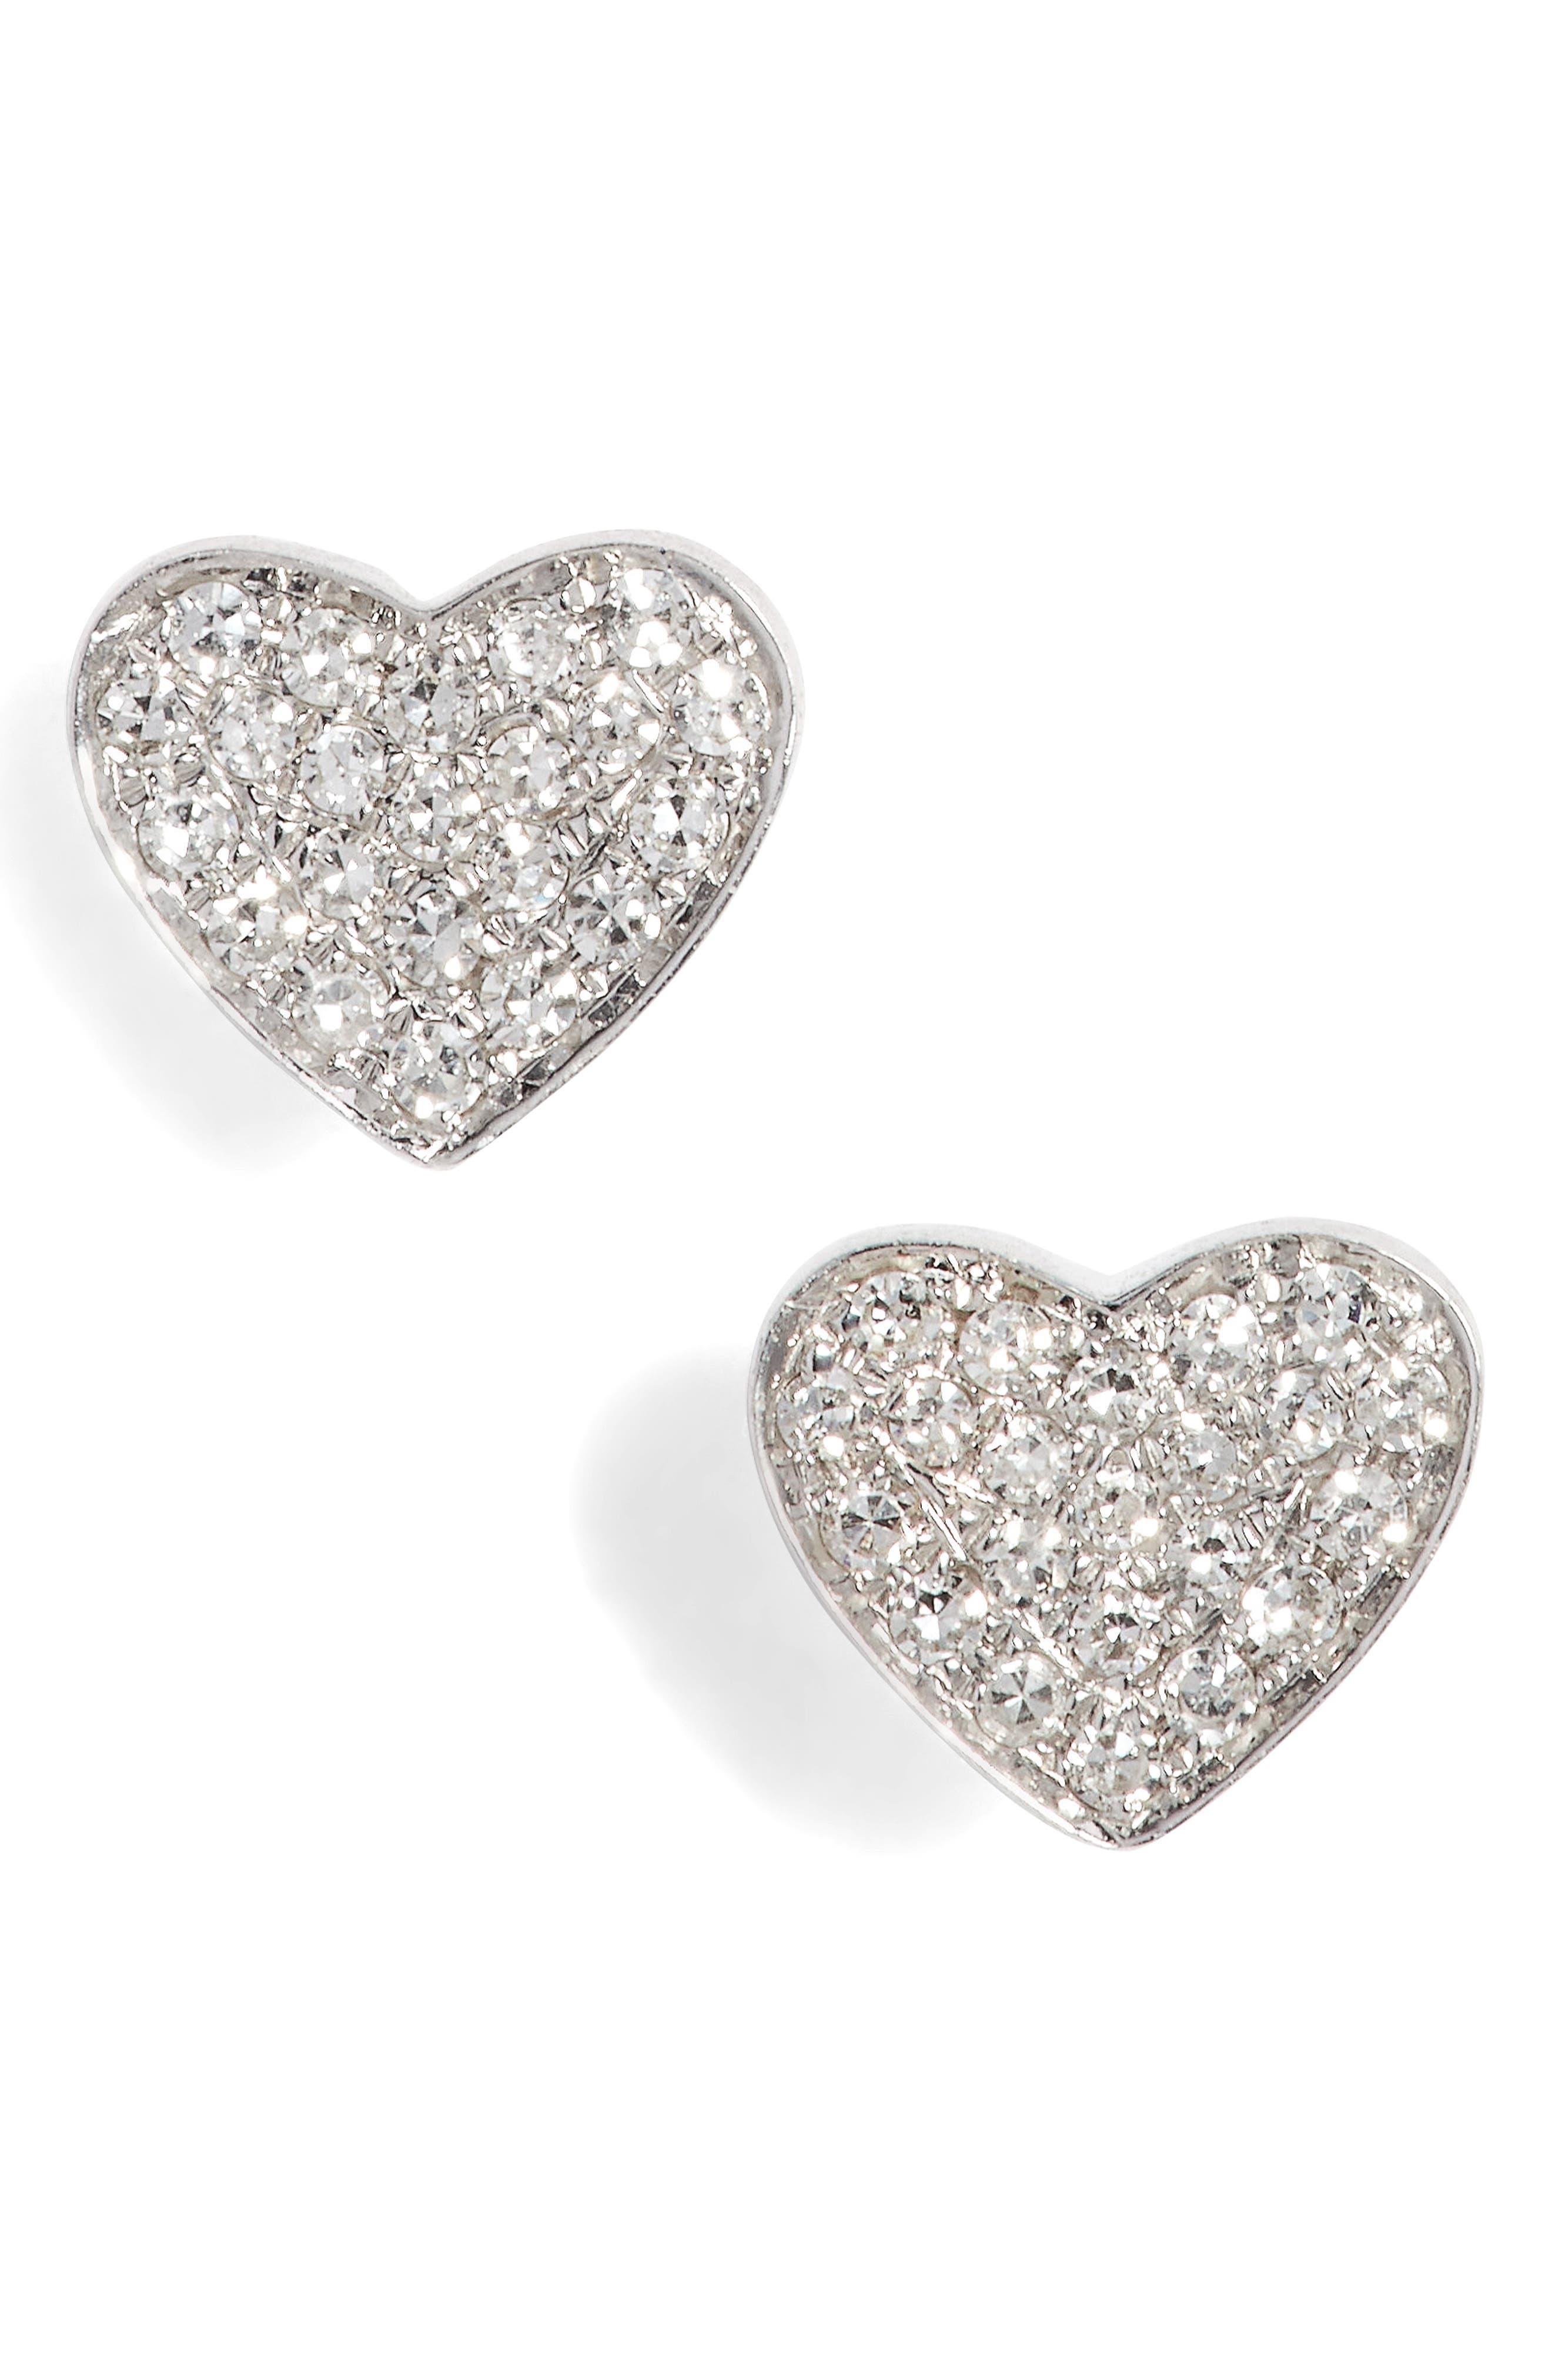 Diamond Heart Stud Earrings,                         Main,                         color, White Gold